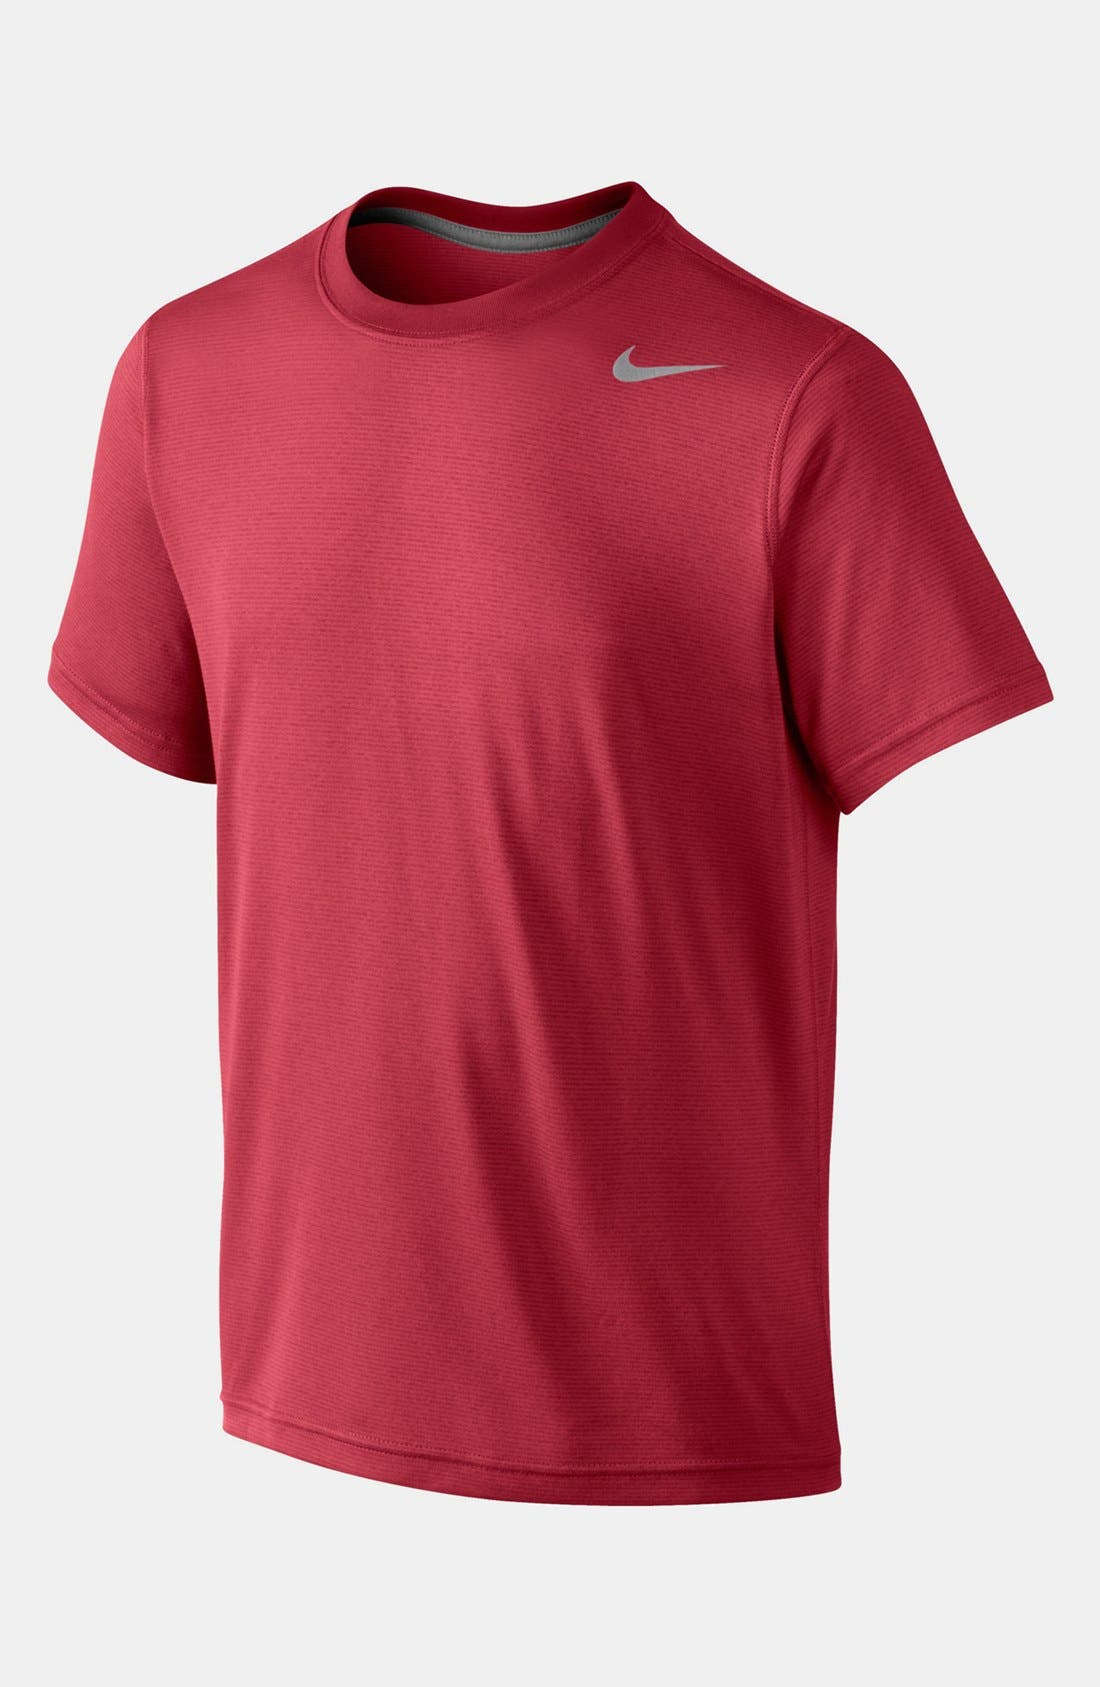 Alternate Image 1 Selected - Nike 'Vapor Touch Legend' T-Shirt (Big Boys)